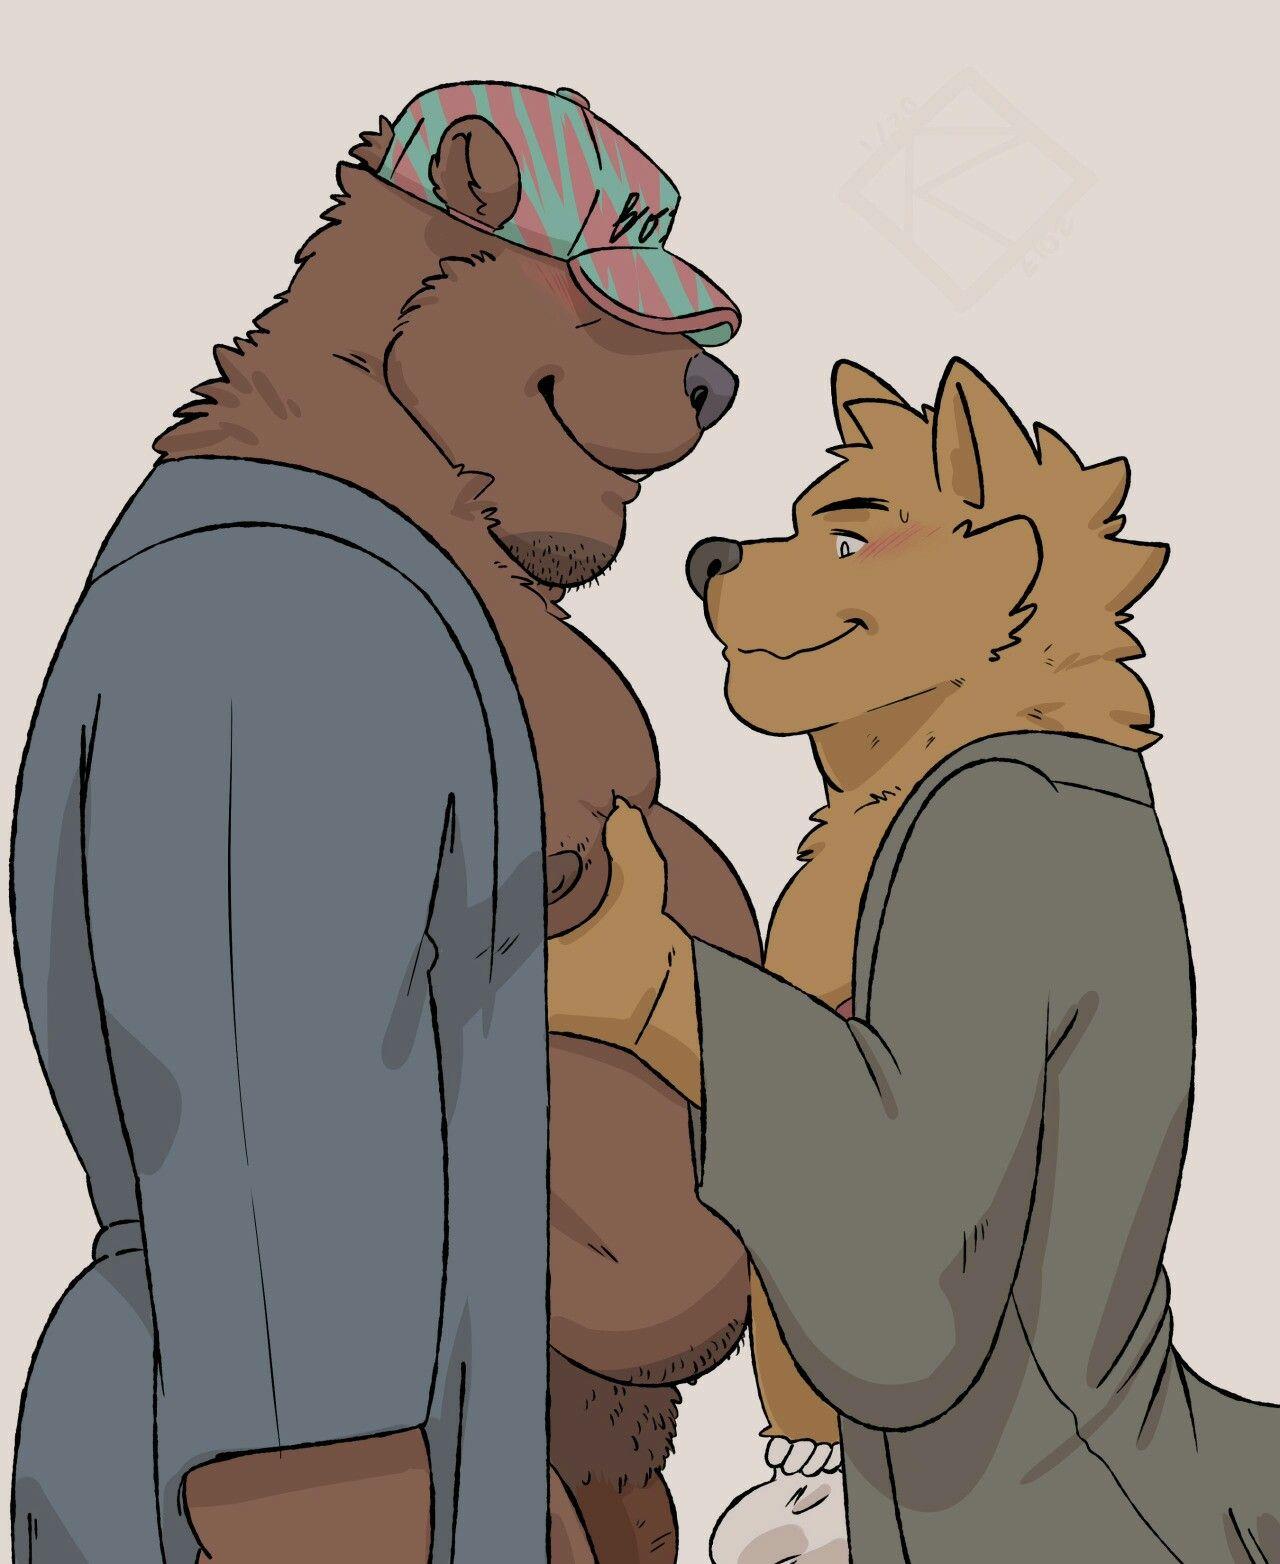 Cheeky yet beautiful gay bear